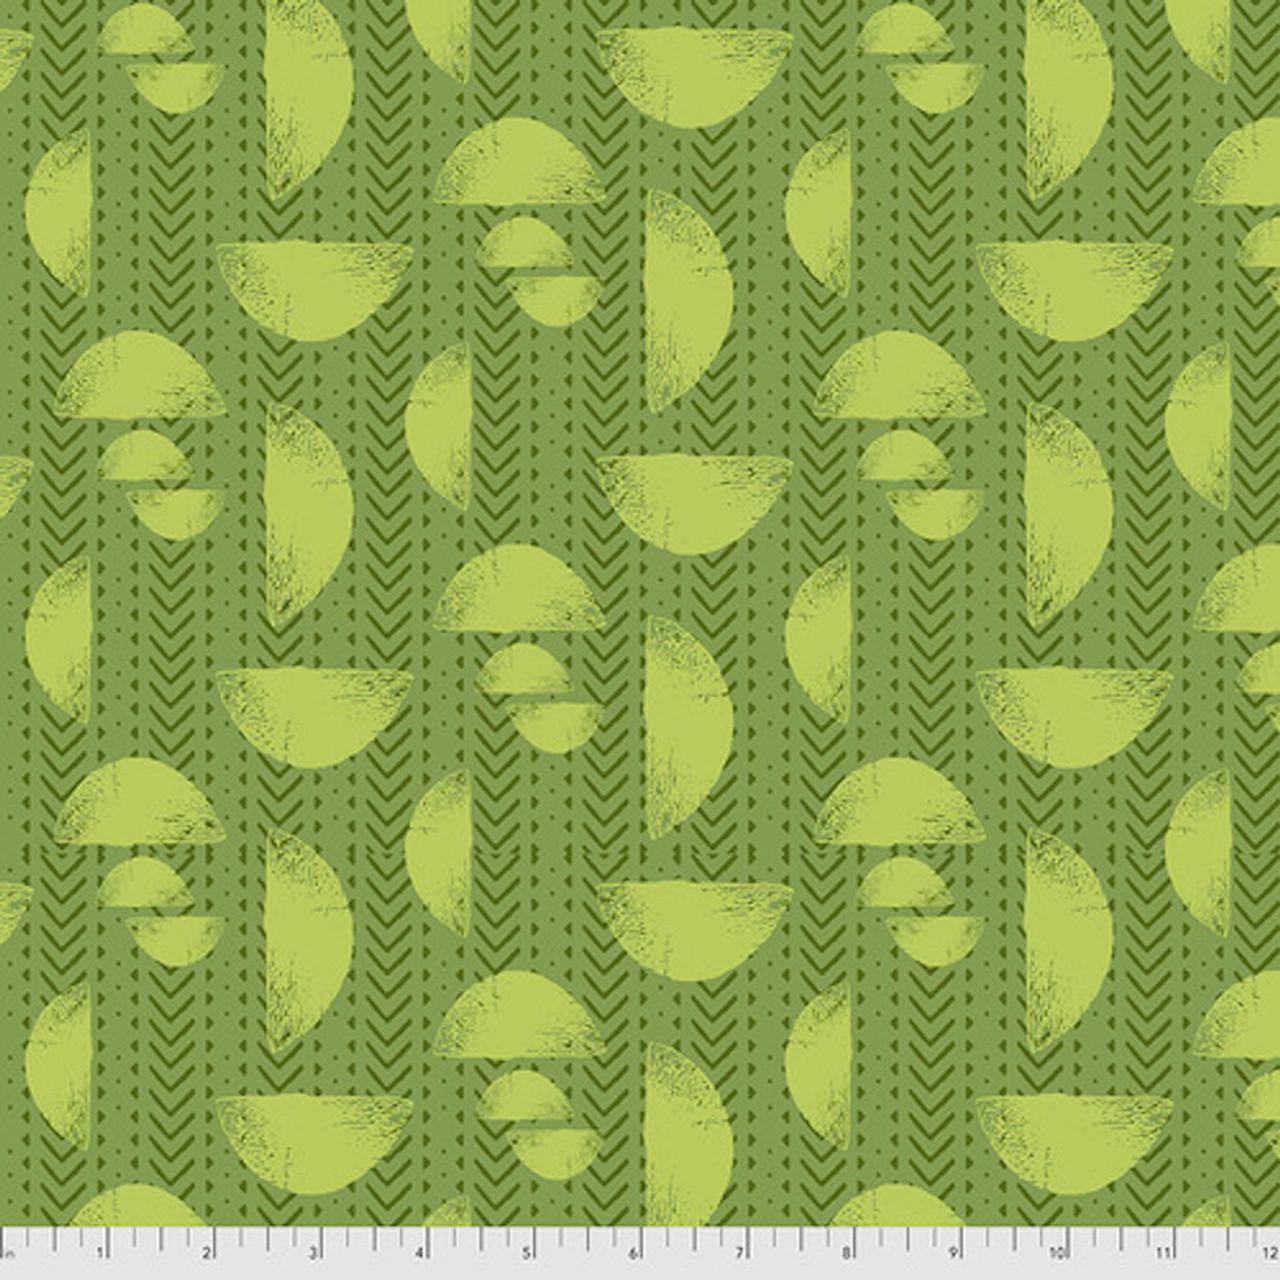 Free Spirit Sew Kind Of Wonderful Mod Cloth Rocks Earth Cotton Fabric By The Yard